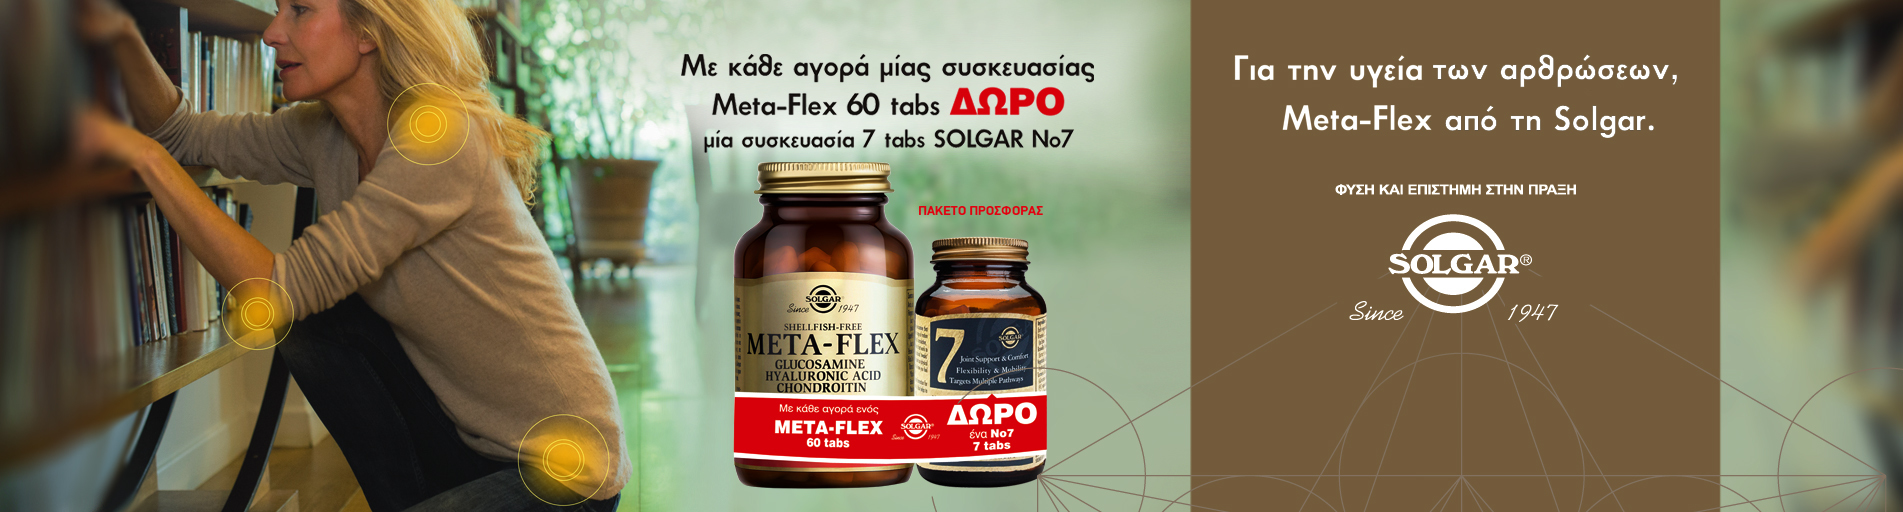 Metaflex no7 1903